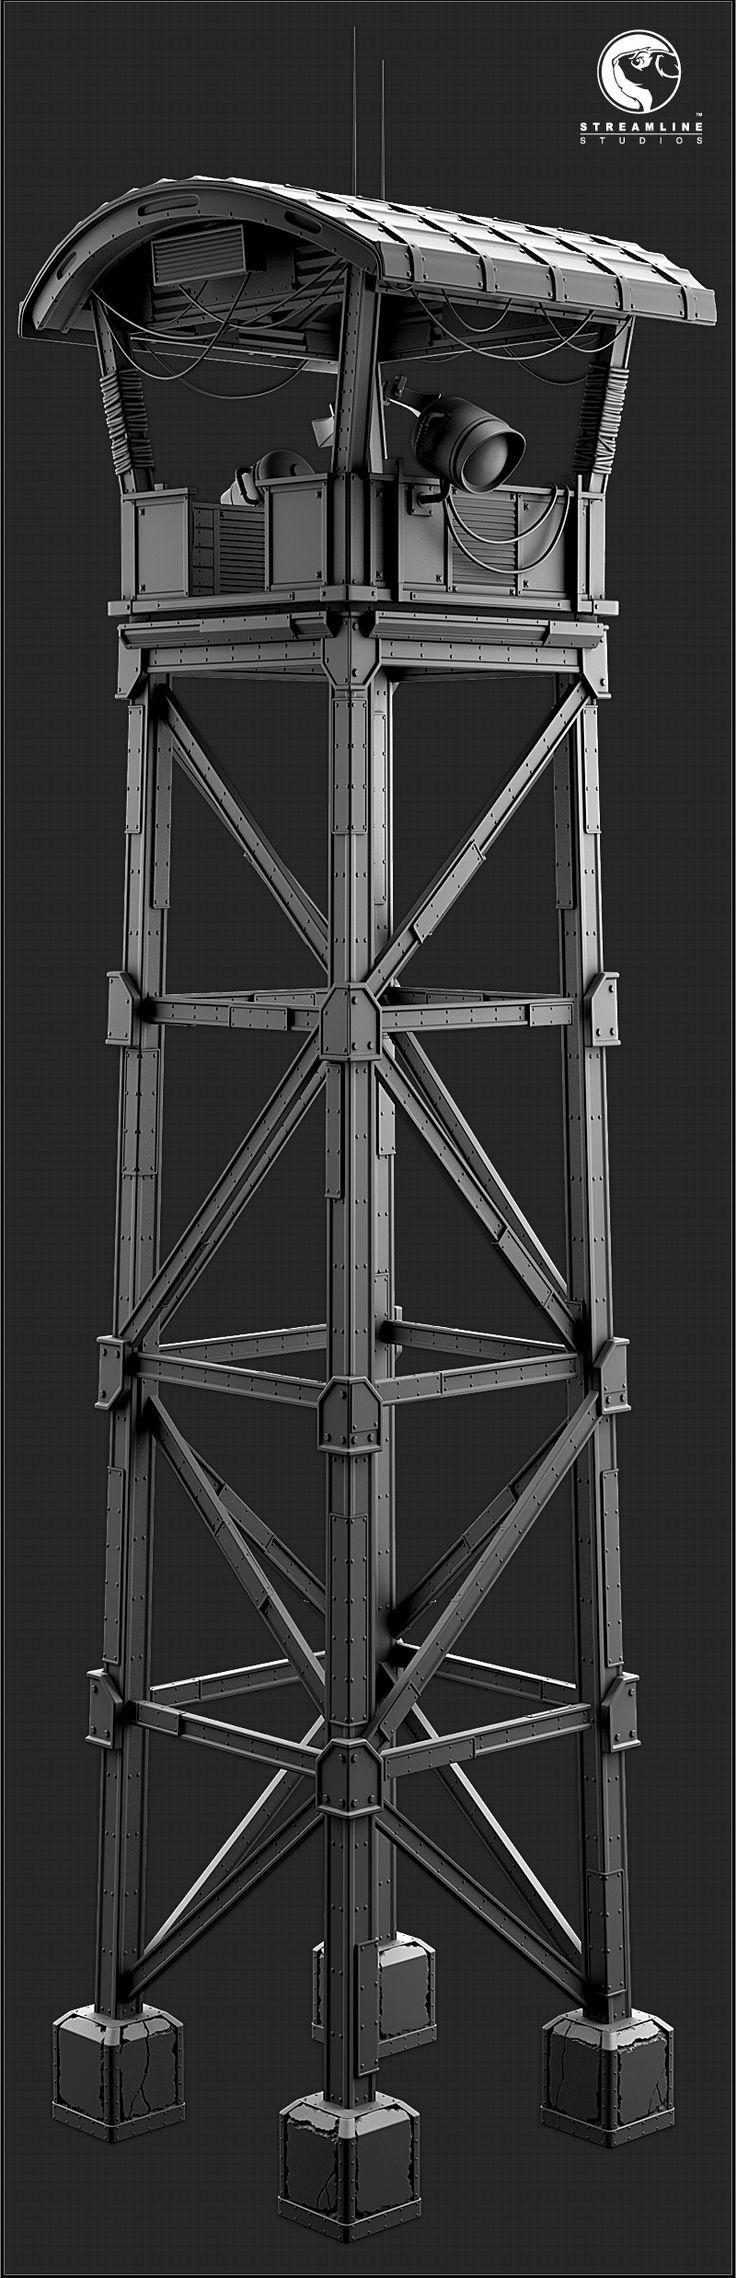 tower_rw.jpg (800×2477)